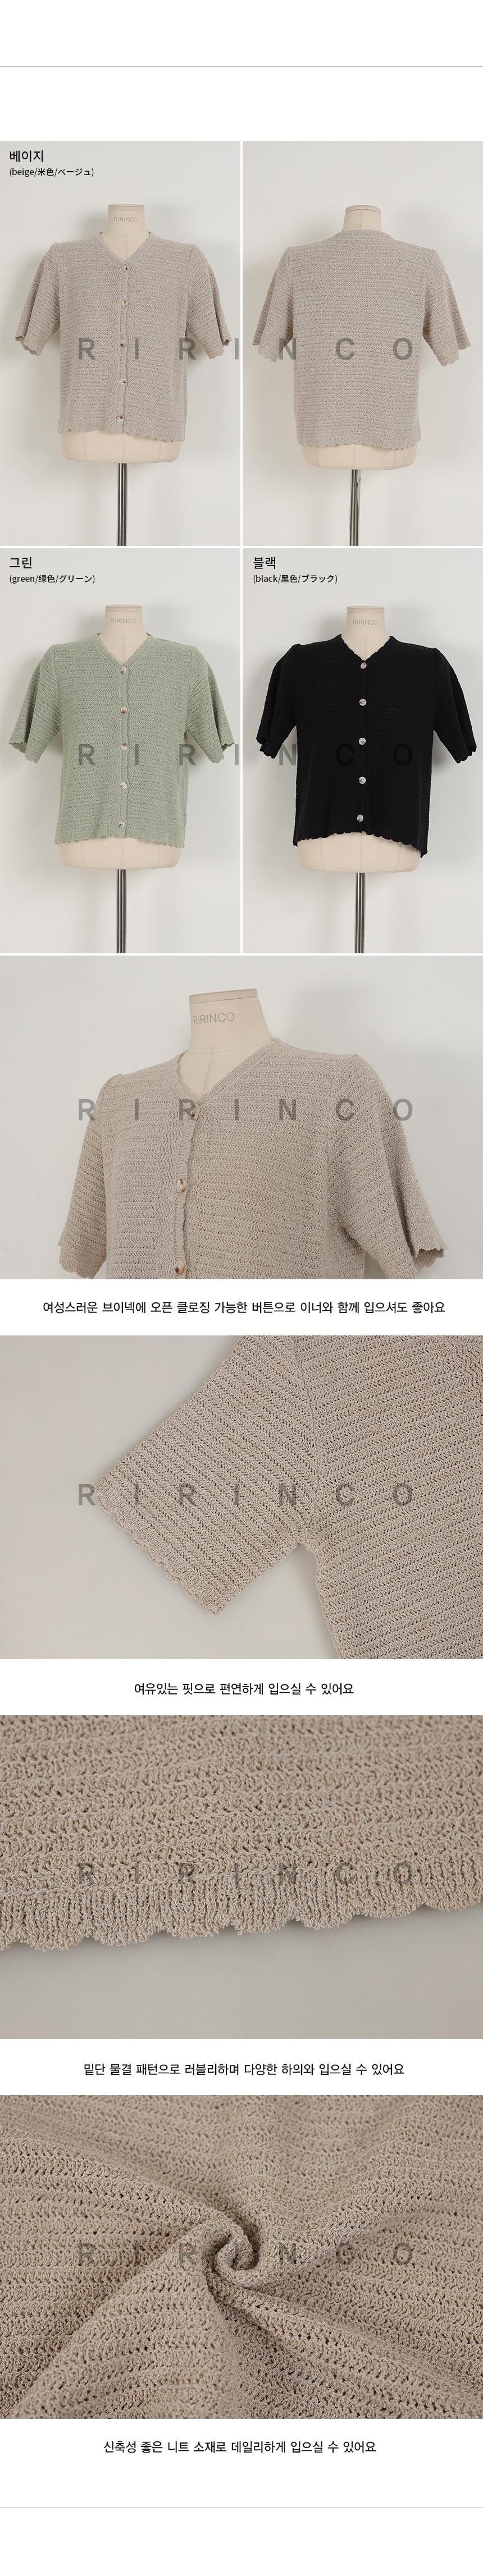 RIRINCO ウェーブカットⅤネックニットカーディガン